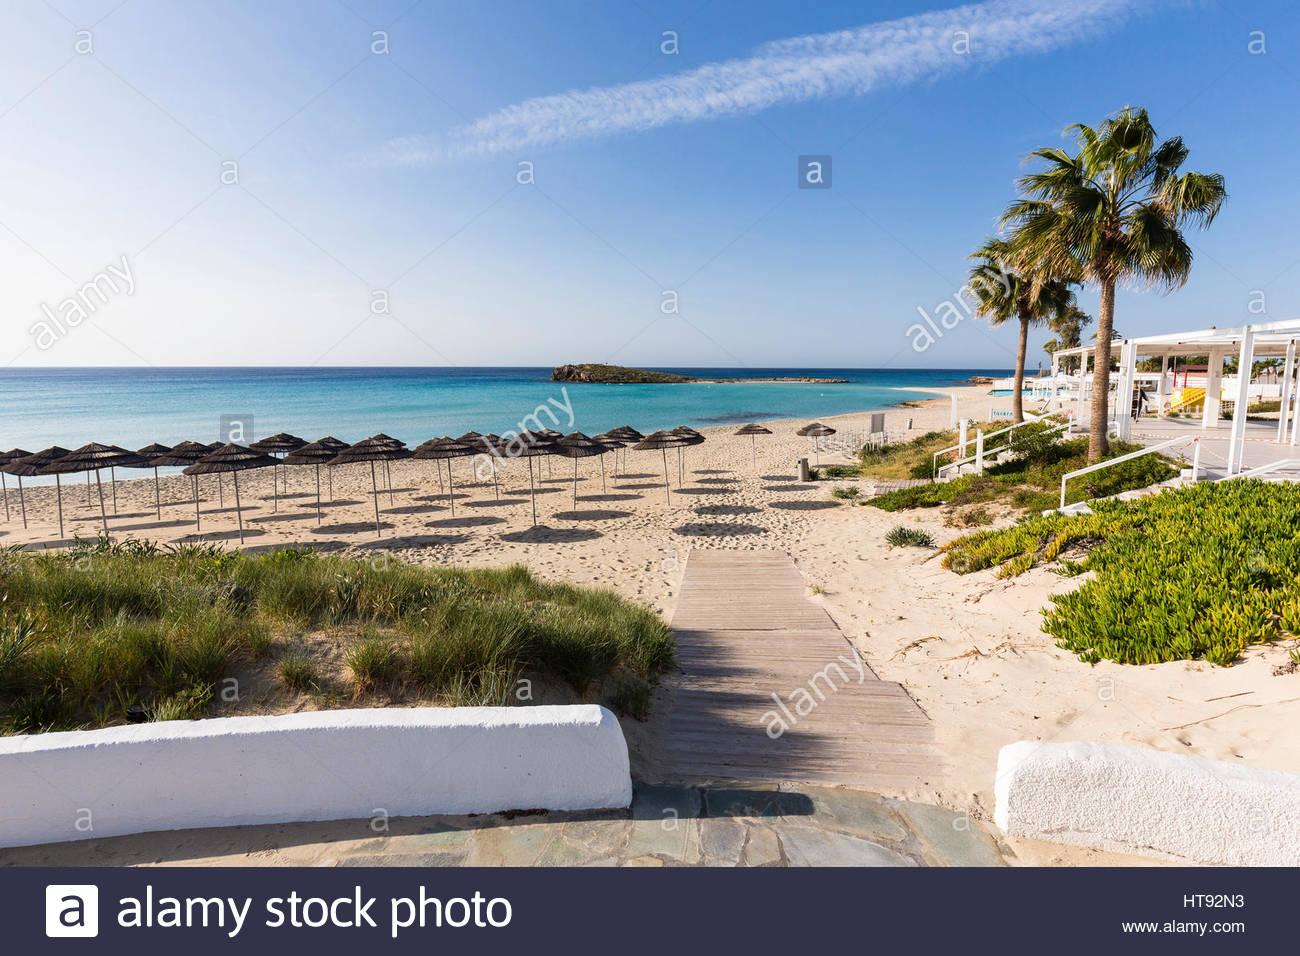 Sonnenschirme am Nissi Strand Nissi Beach Resort in Agia Napa in Zypern Stockbild